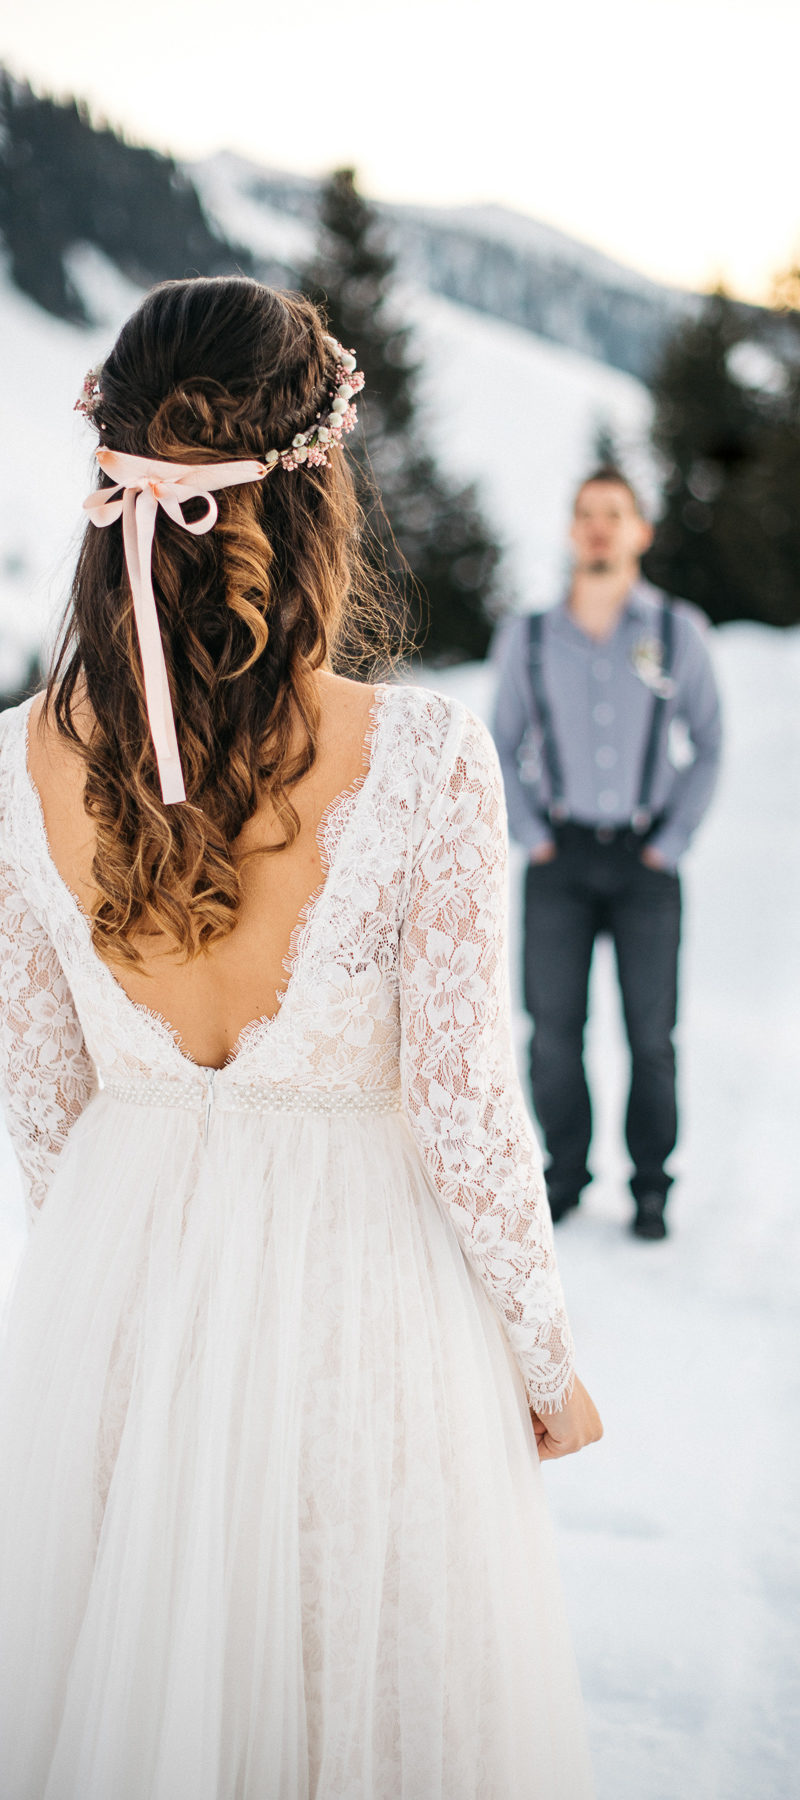 Beautiful Maira wearing Noya Bridal to her Winter Wonderland Wedding